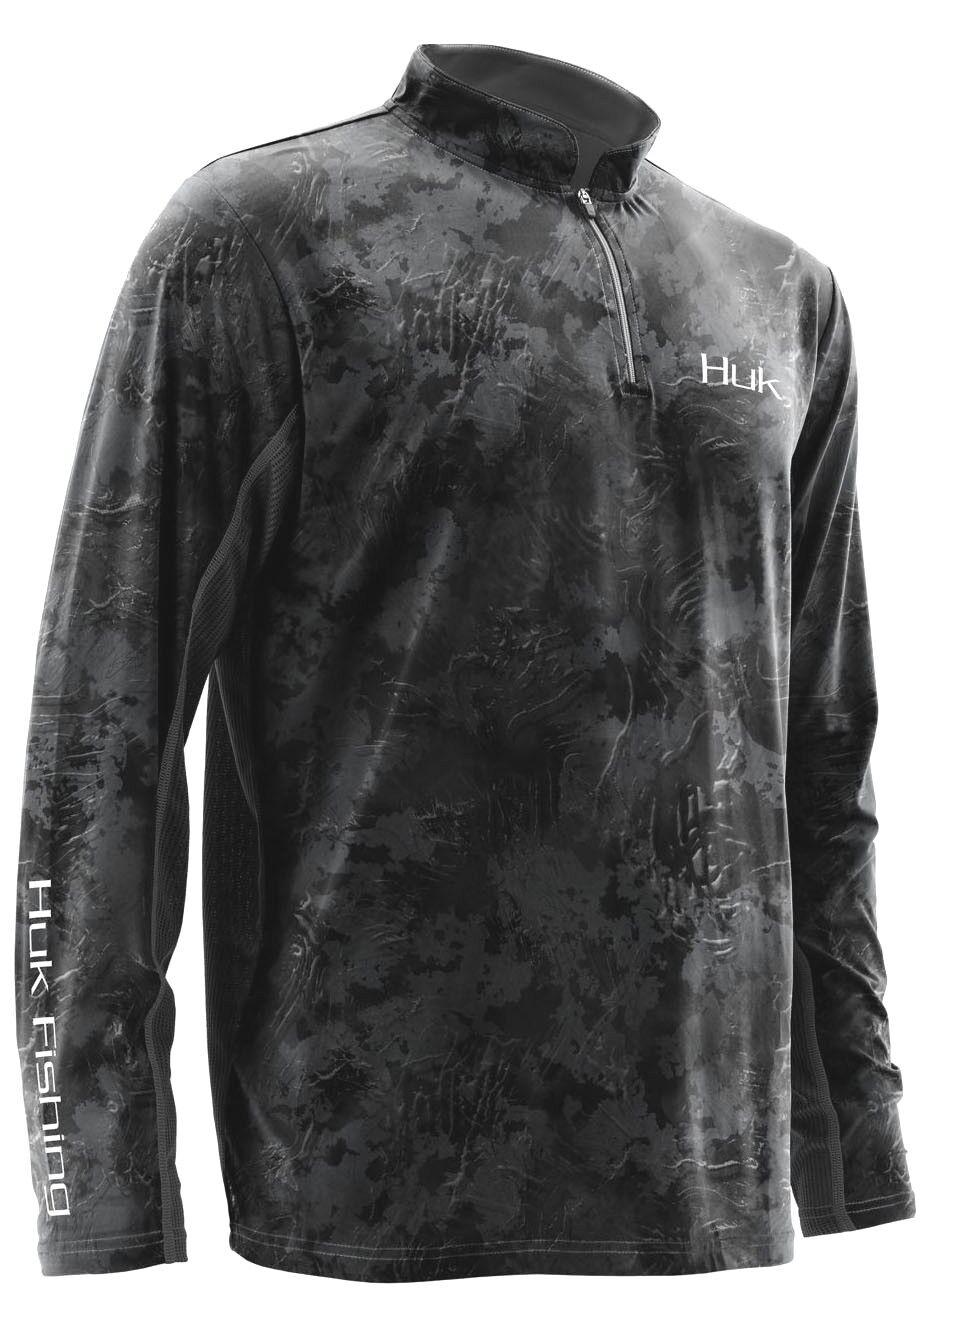 Huk mens subphantis icon 14 zip fishing shirt long sleeve upf night vision xl